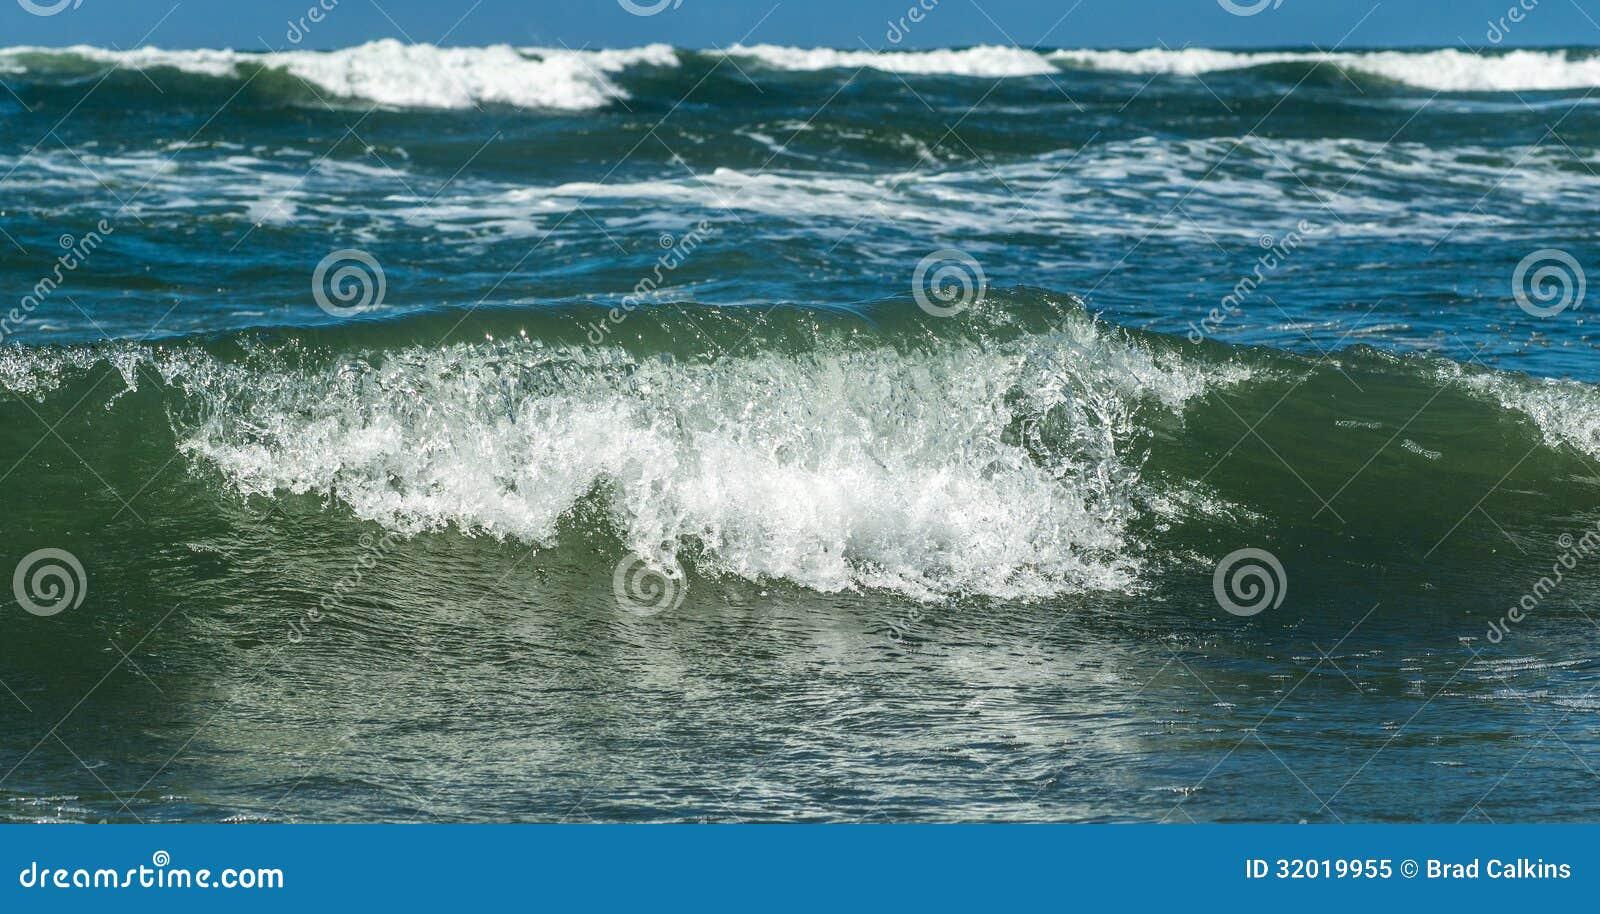 Ocean Wave Royalty Free Stock Photo - Image: 32019955 Pacific Ocean Water